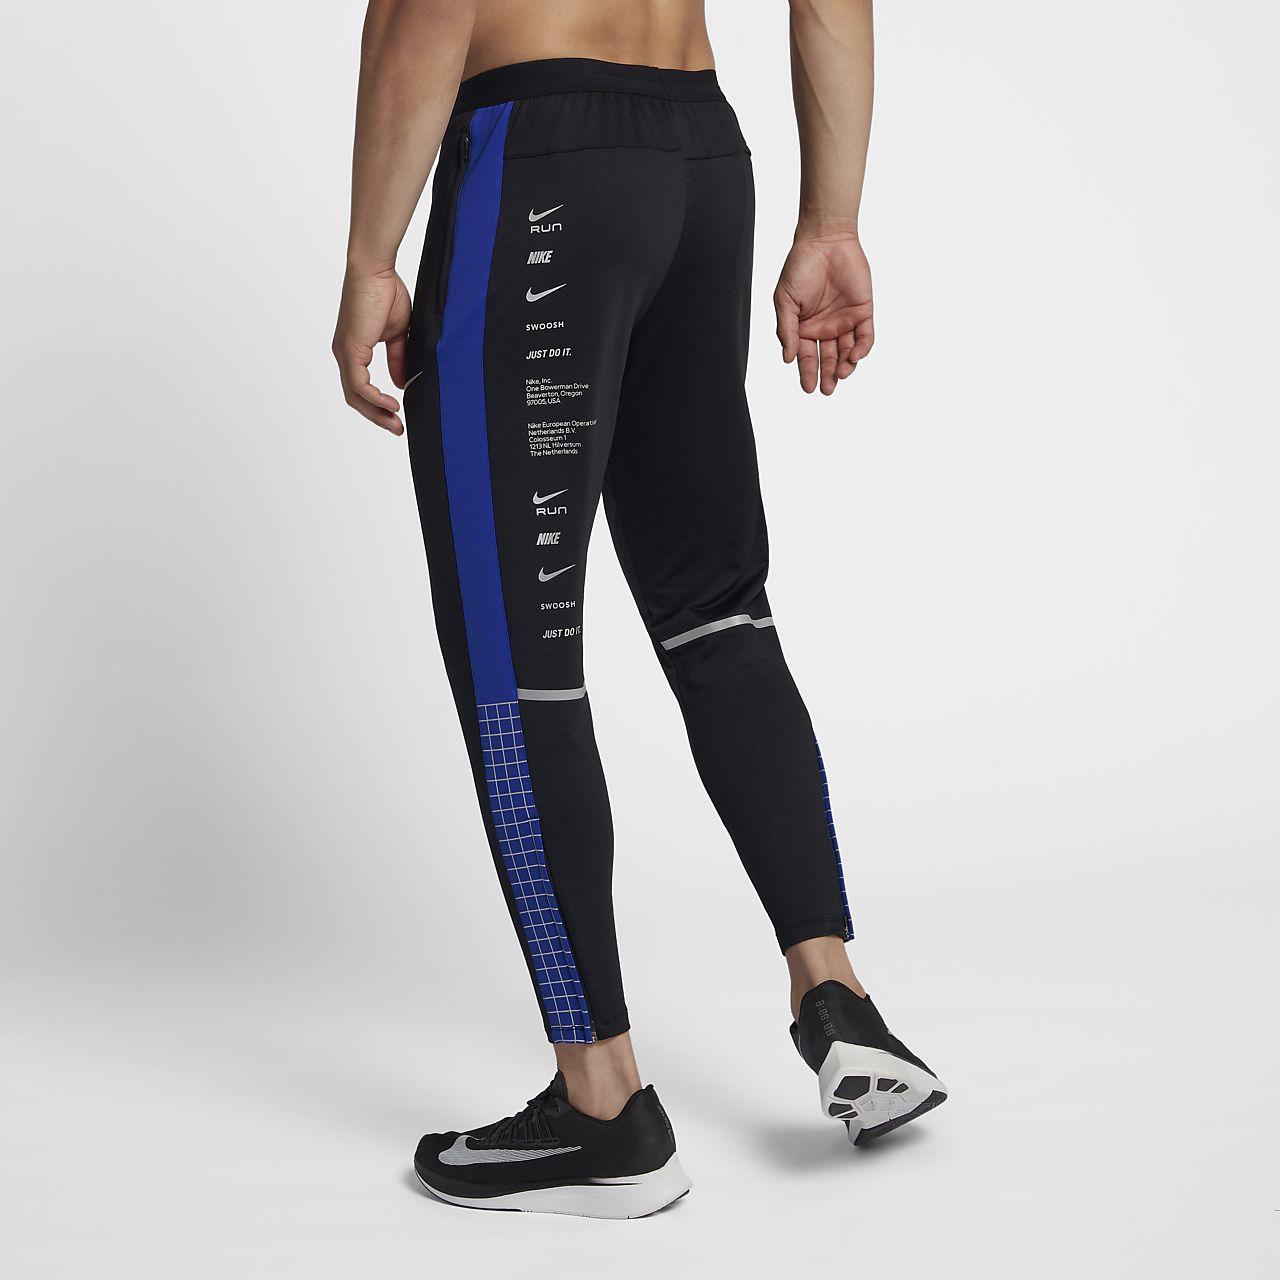 0e02e5f14bdafd Nike Phenom Men s Running Trousers. Nike.com CA